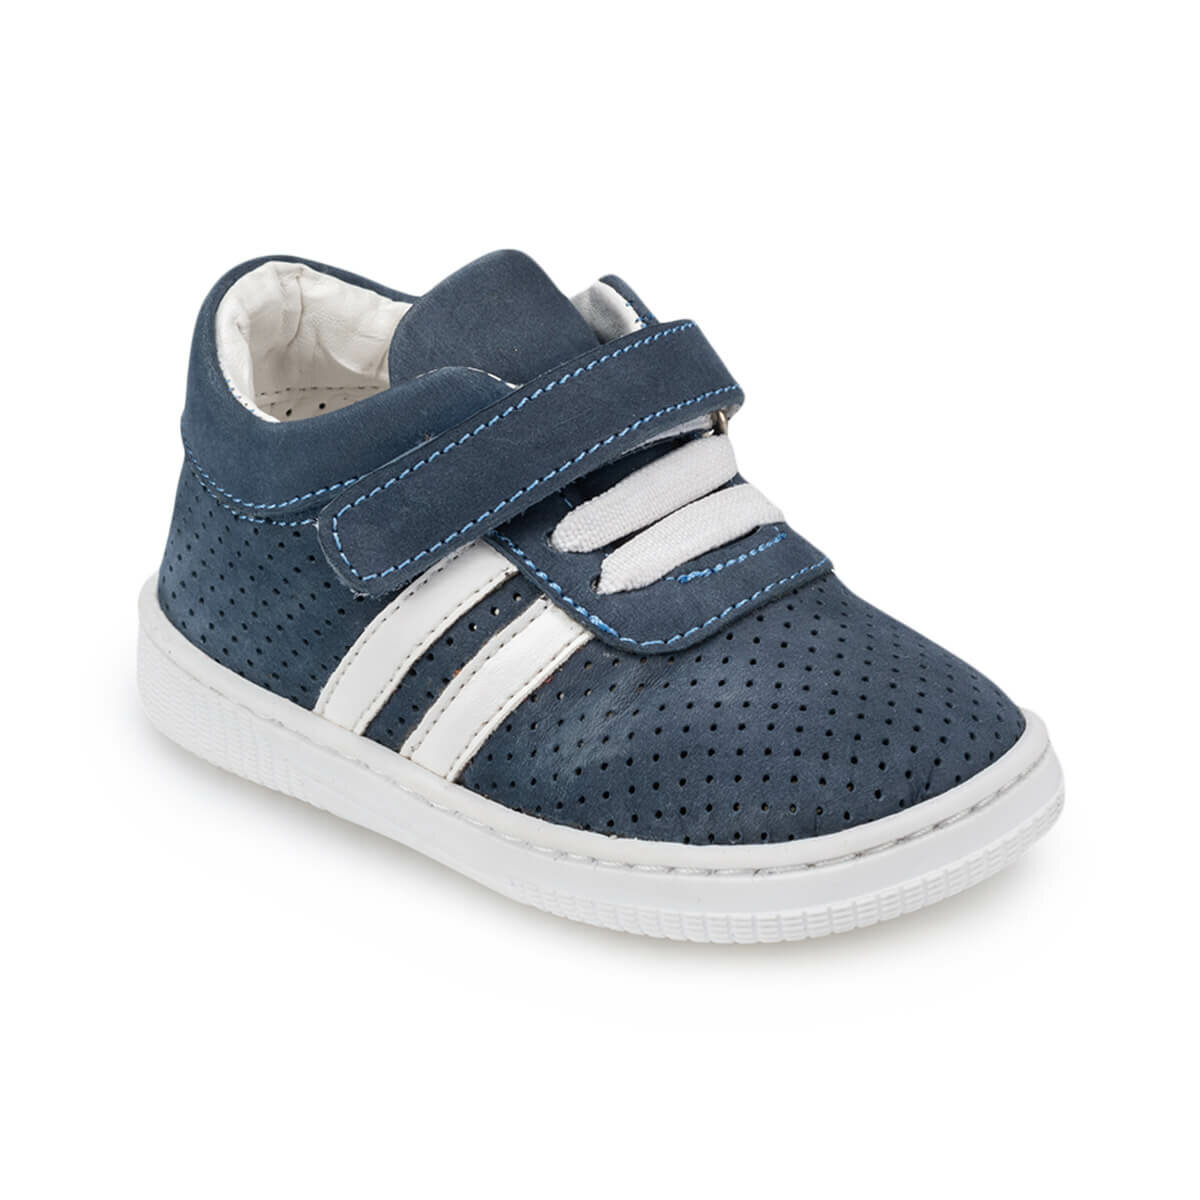 FLO 91. 511080.I Navy Blue Male Child Sneaker Shoes Polaris